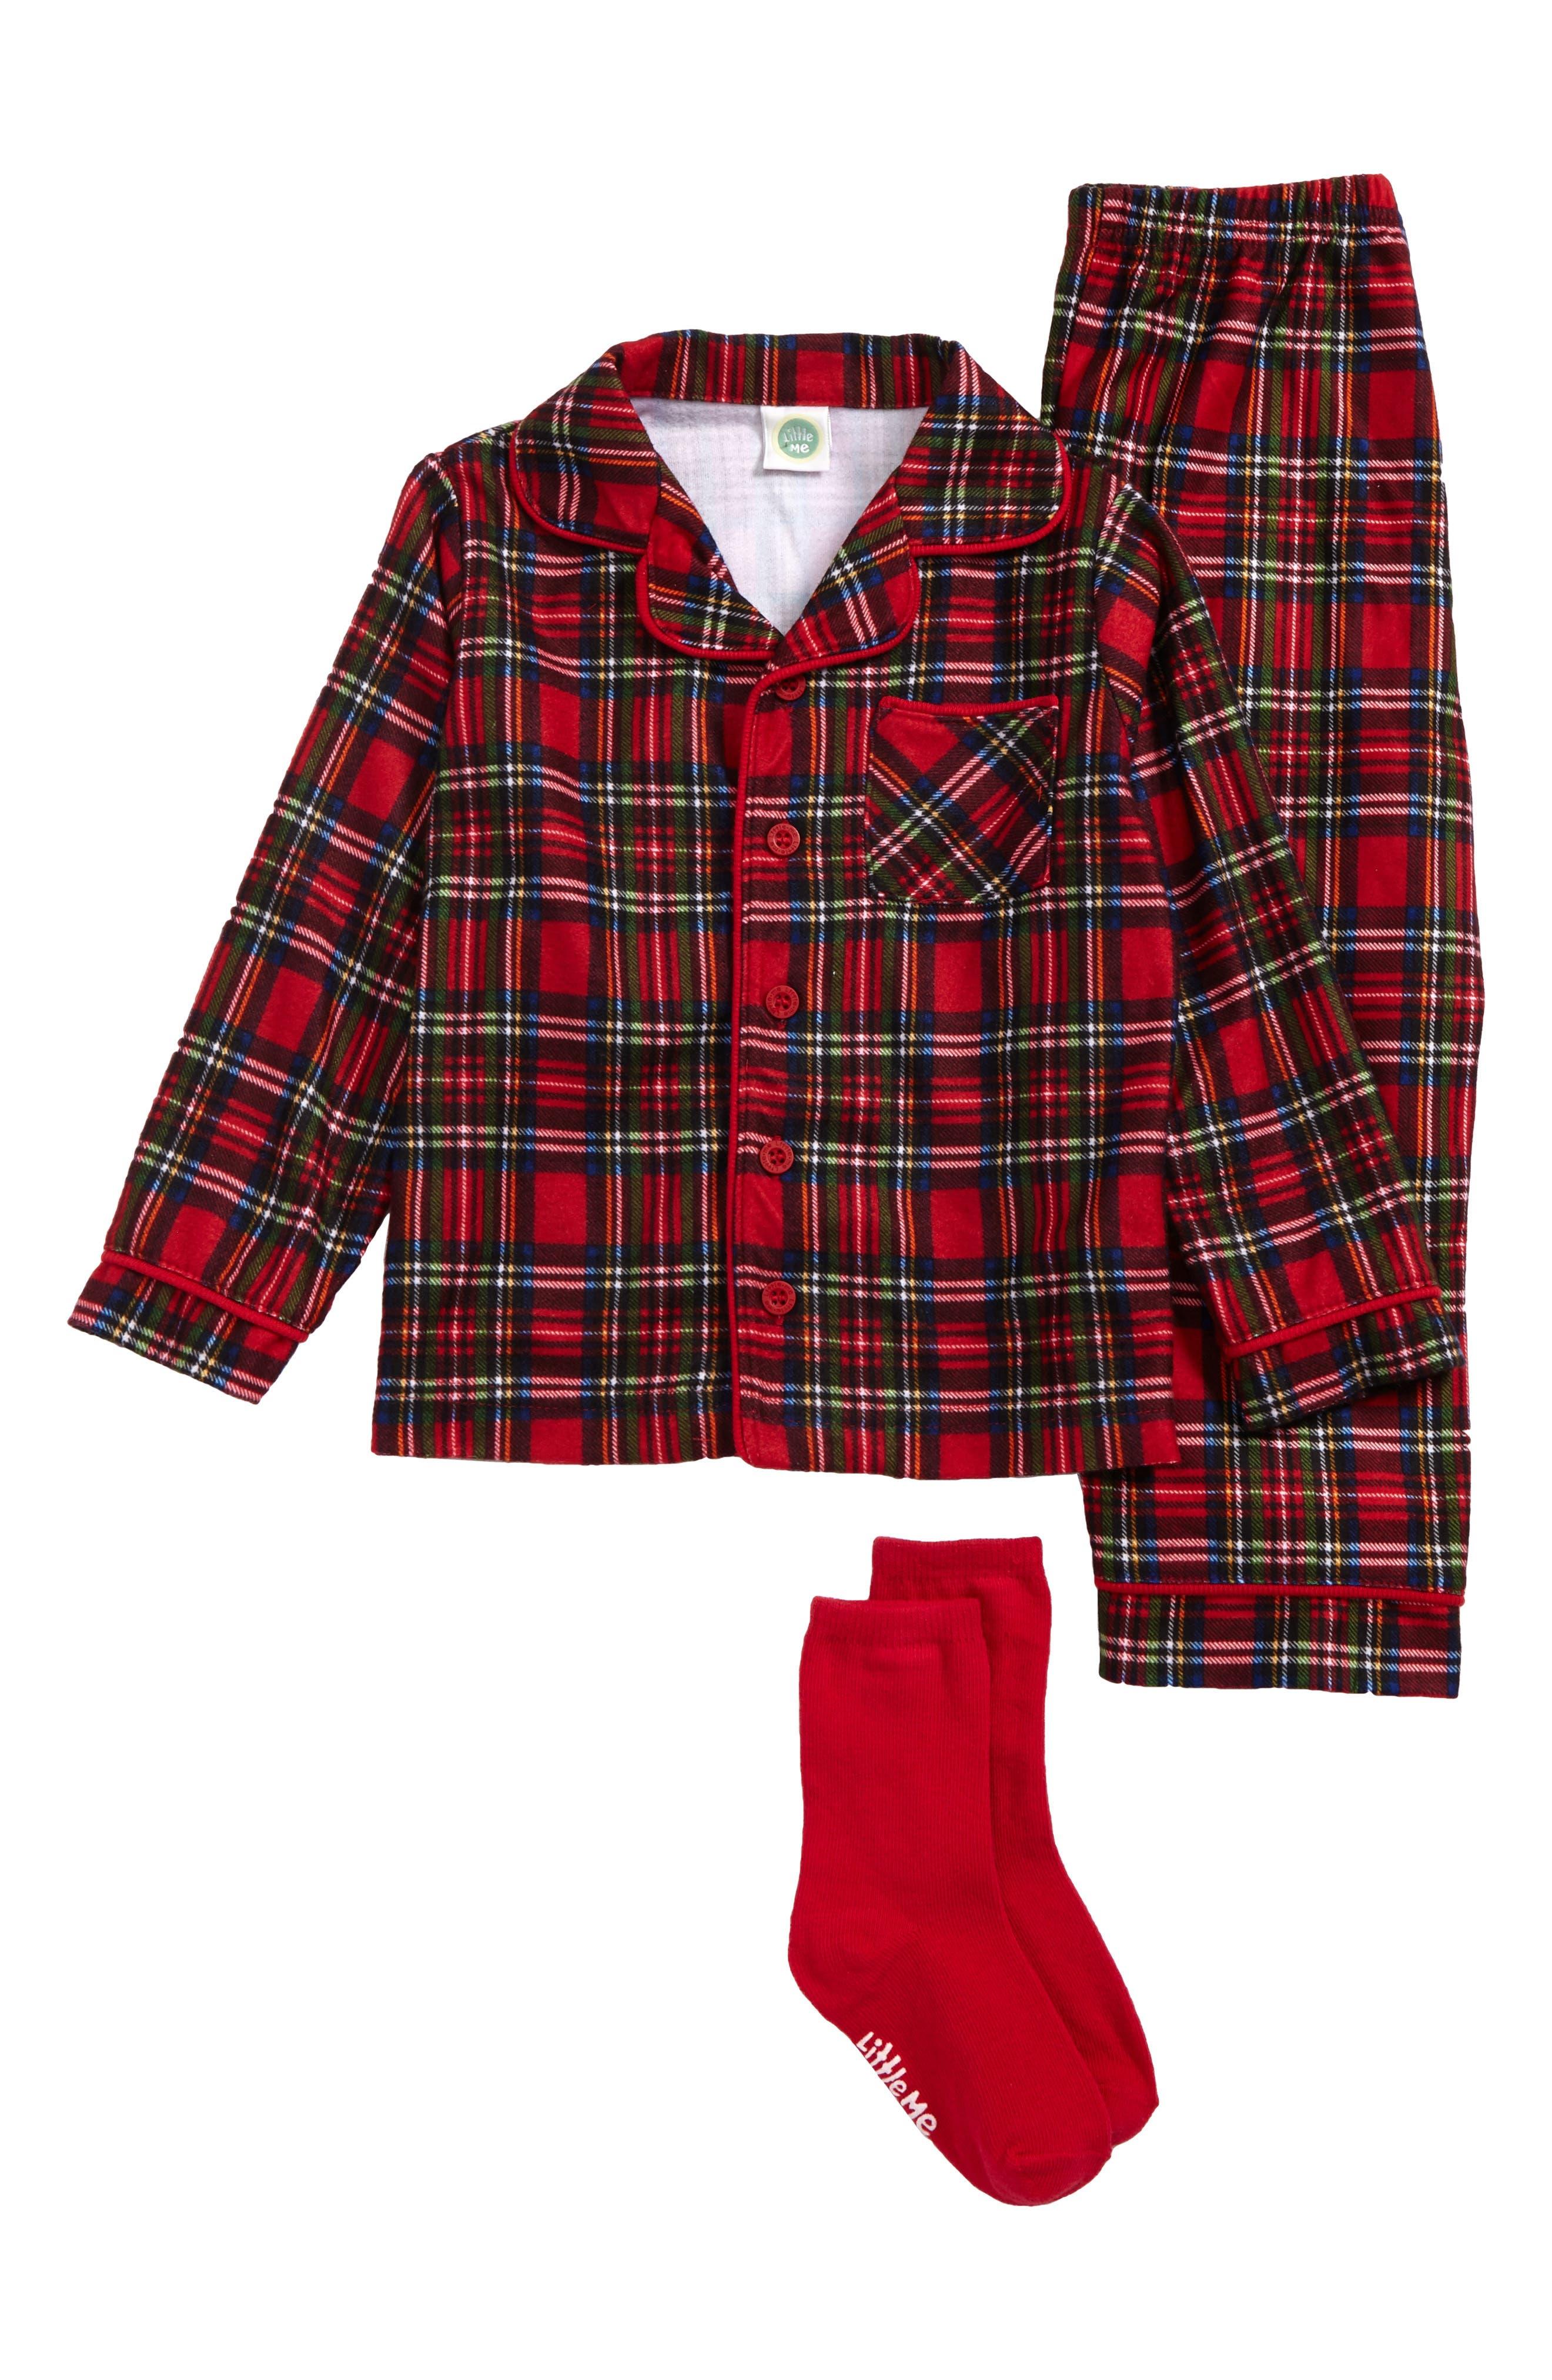 Main Image - Little Me Two-Piece Pajamas & Socks Set (Baby Boys)